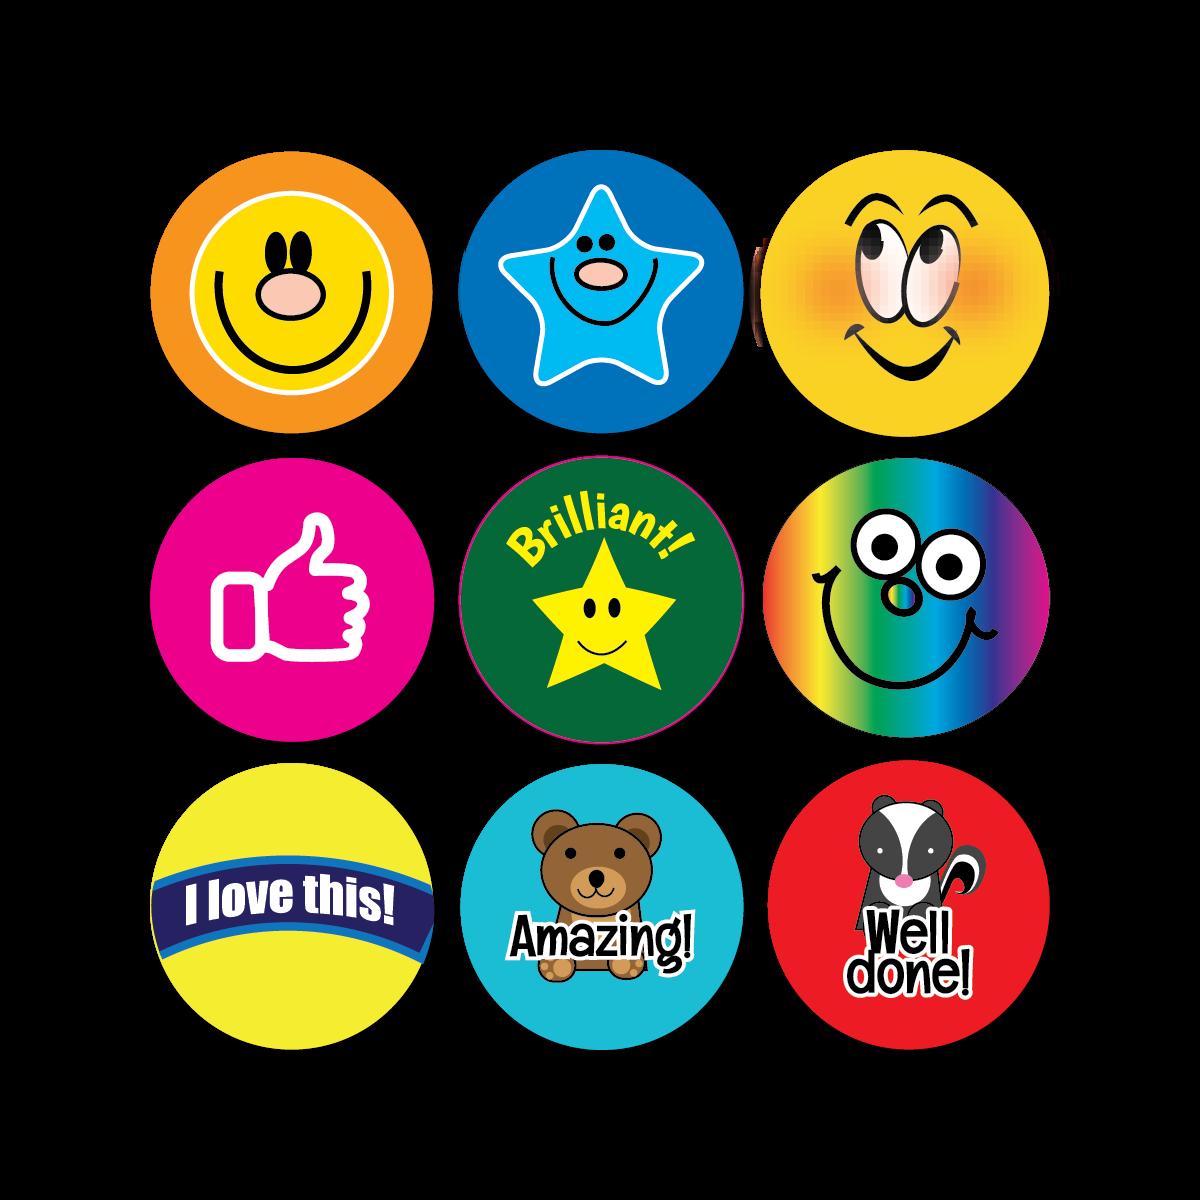 Sticker: Premixed Praise Mini Sticker Bumper Pack - Some Image Only